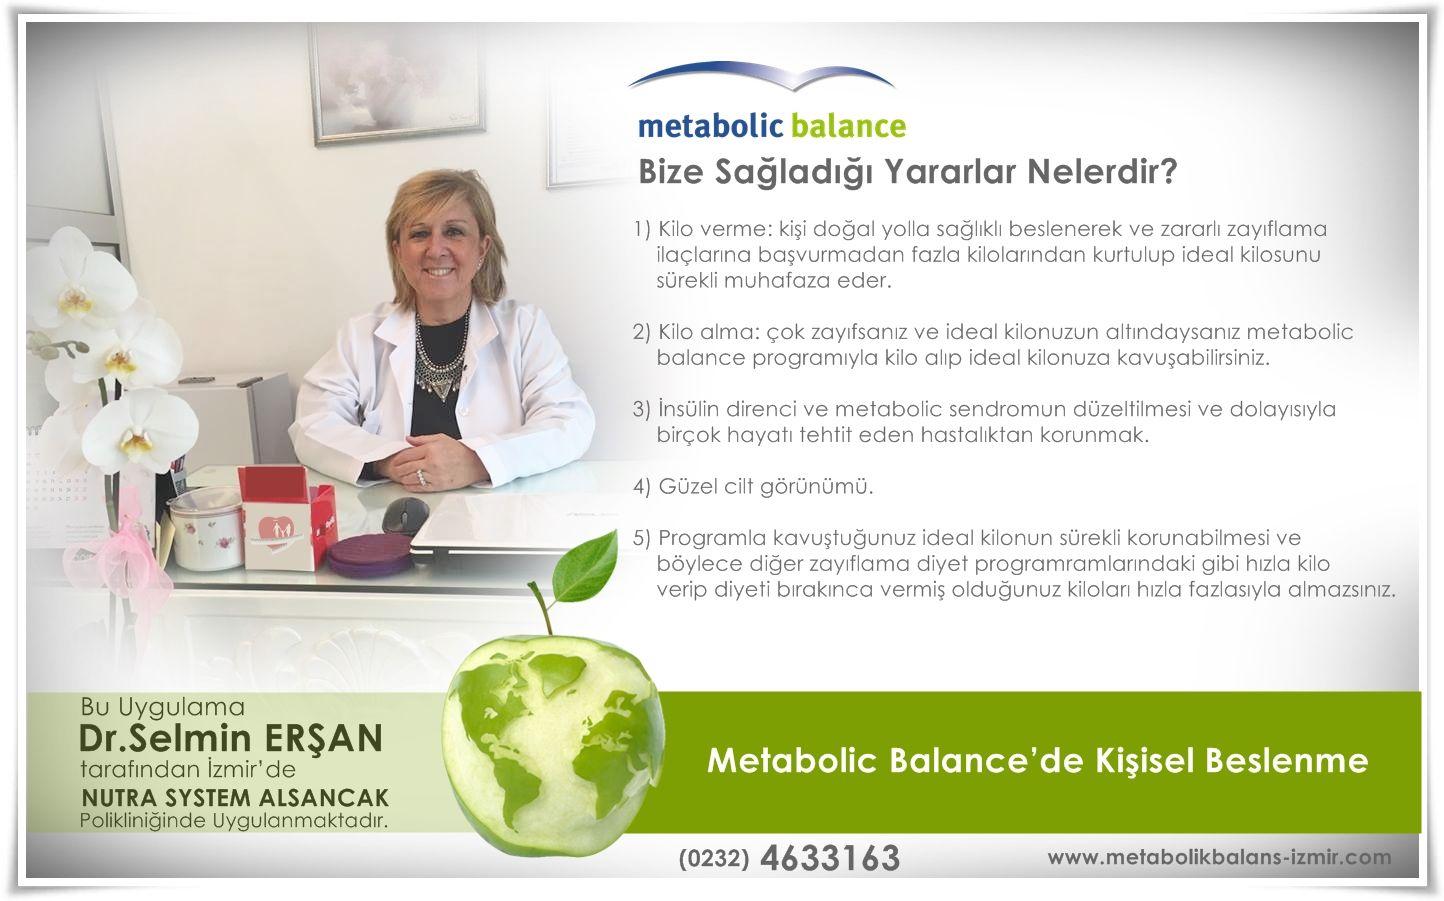 Metabolic Balance İle Zayıflama – Metabolic Balance Diyeti Listesi